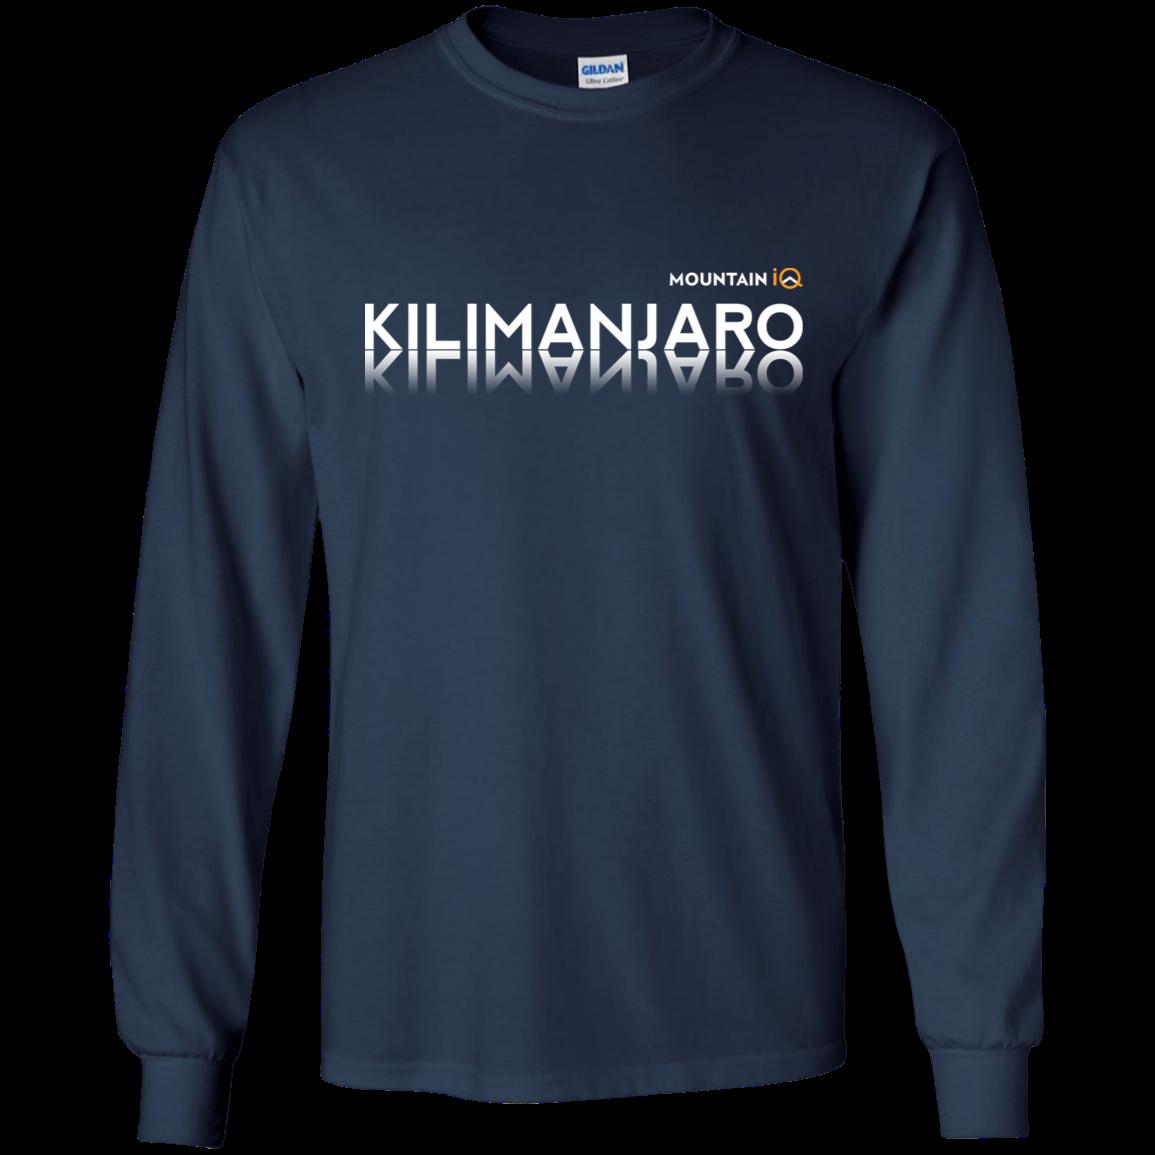 Kilimanjaro Long Sleeve Navy MountainIQ